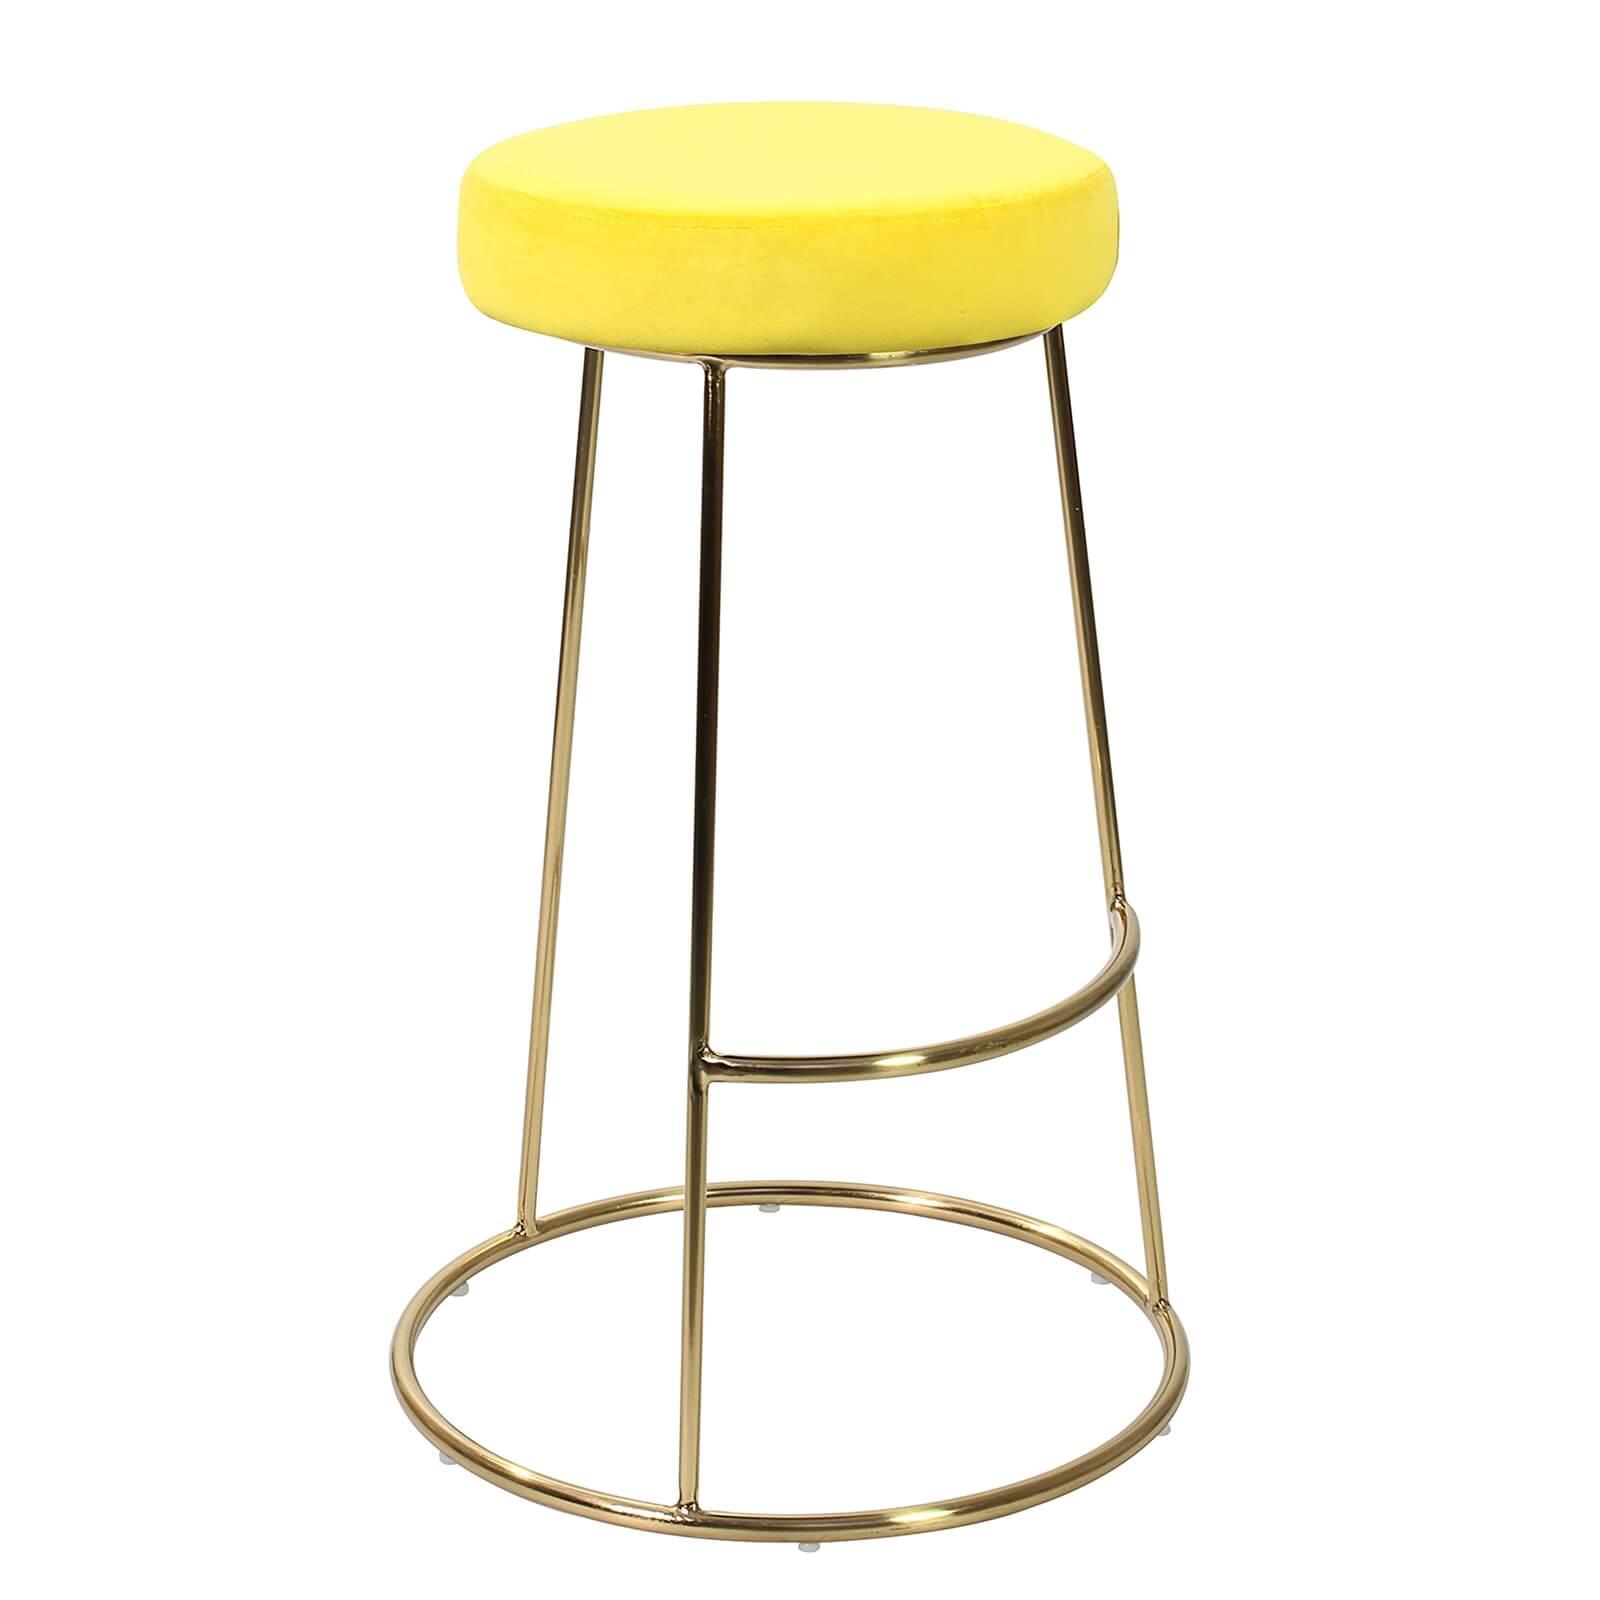 yellow bar stools Best Prices Sale at Tesco, ASDA, The Range, John ...